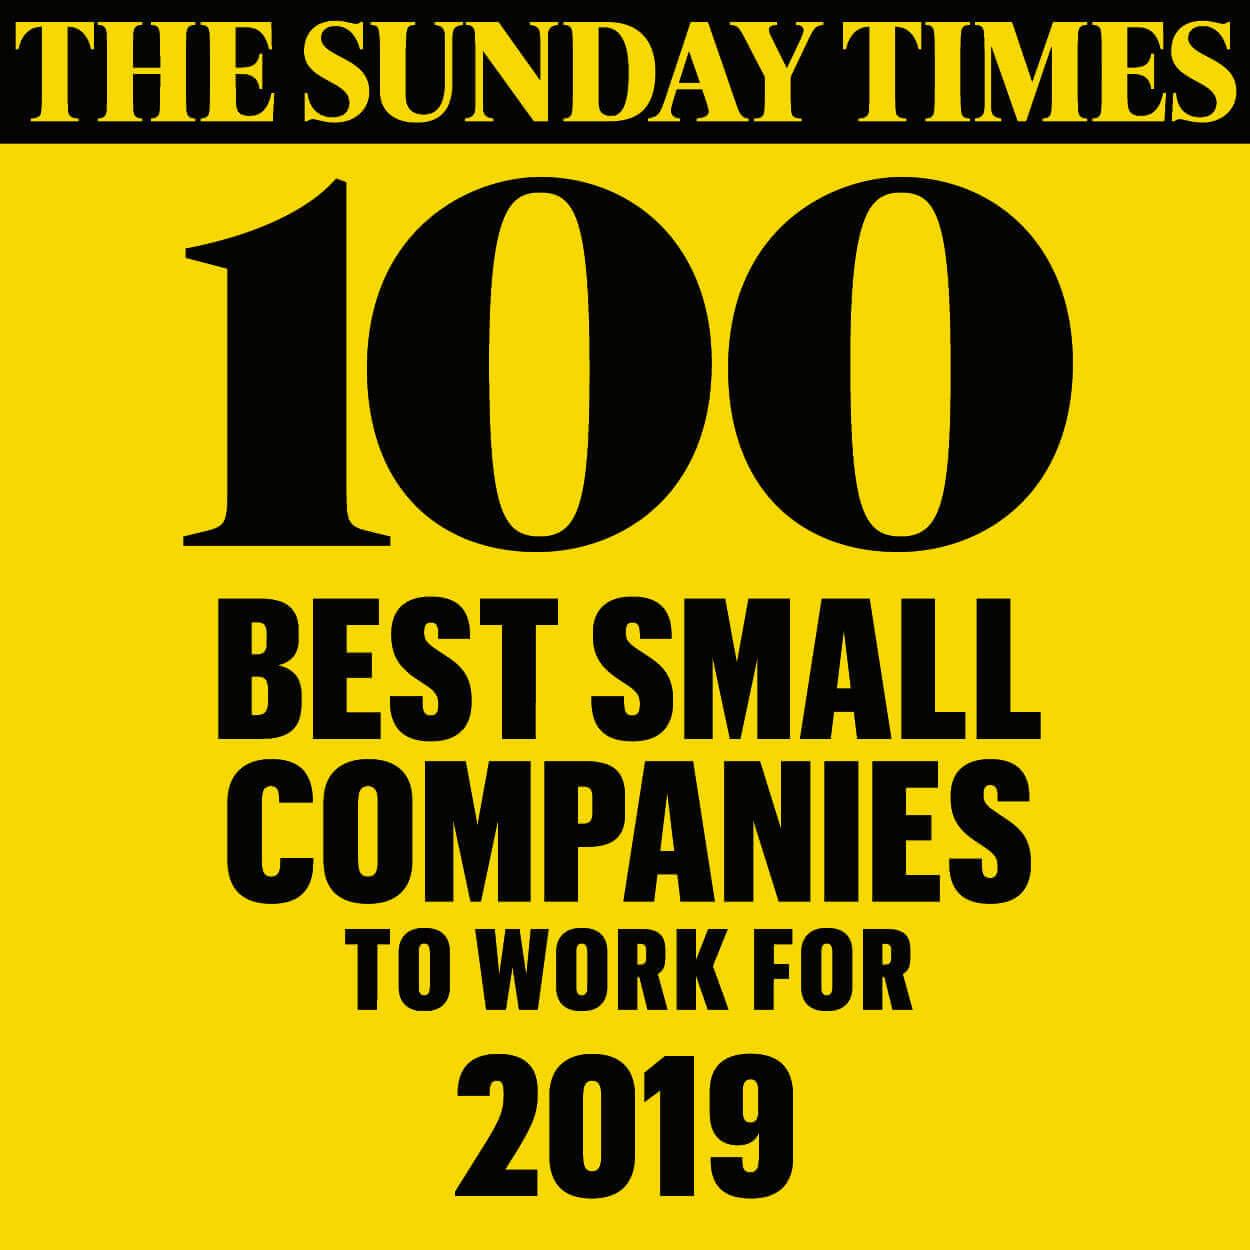 Best small companies logo